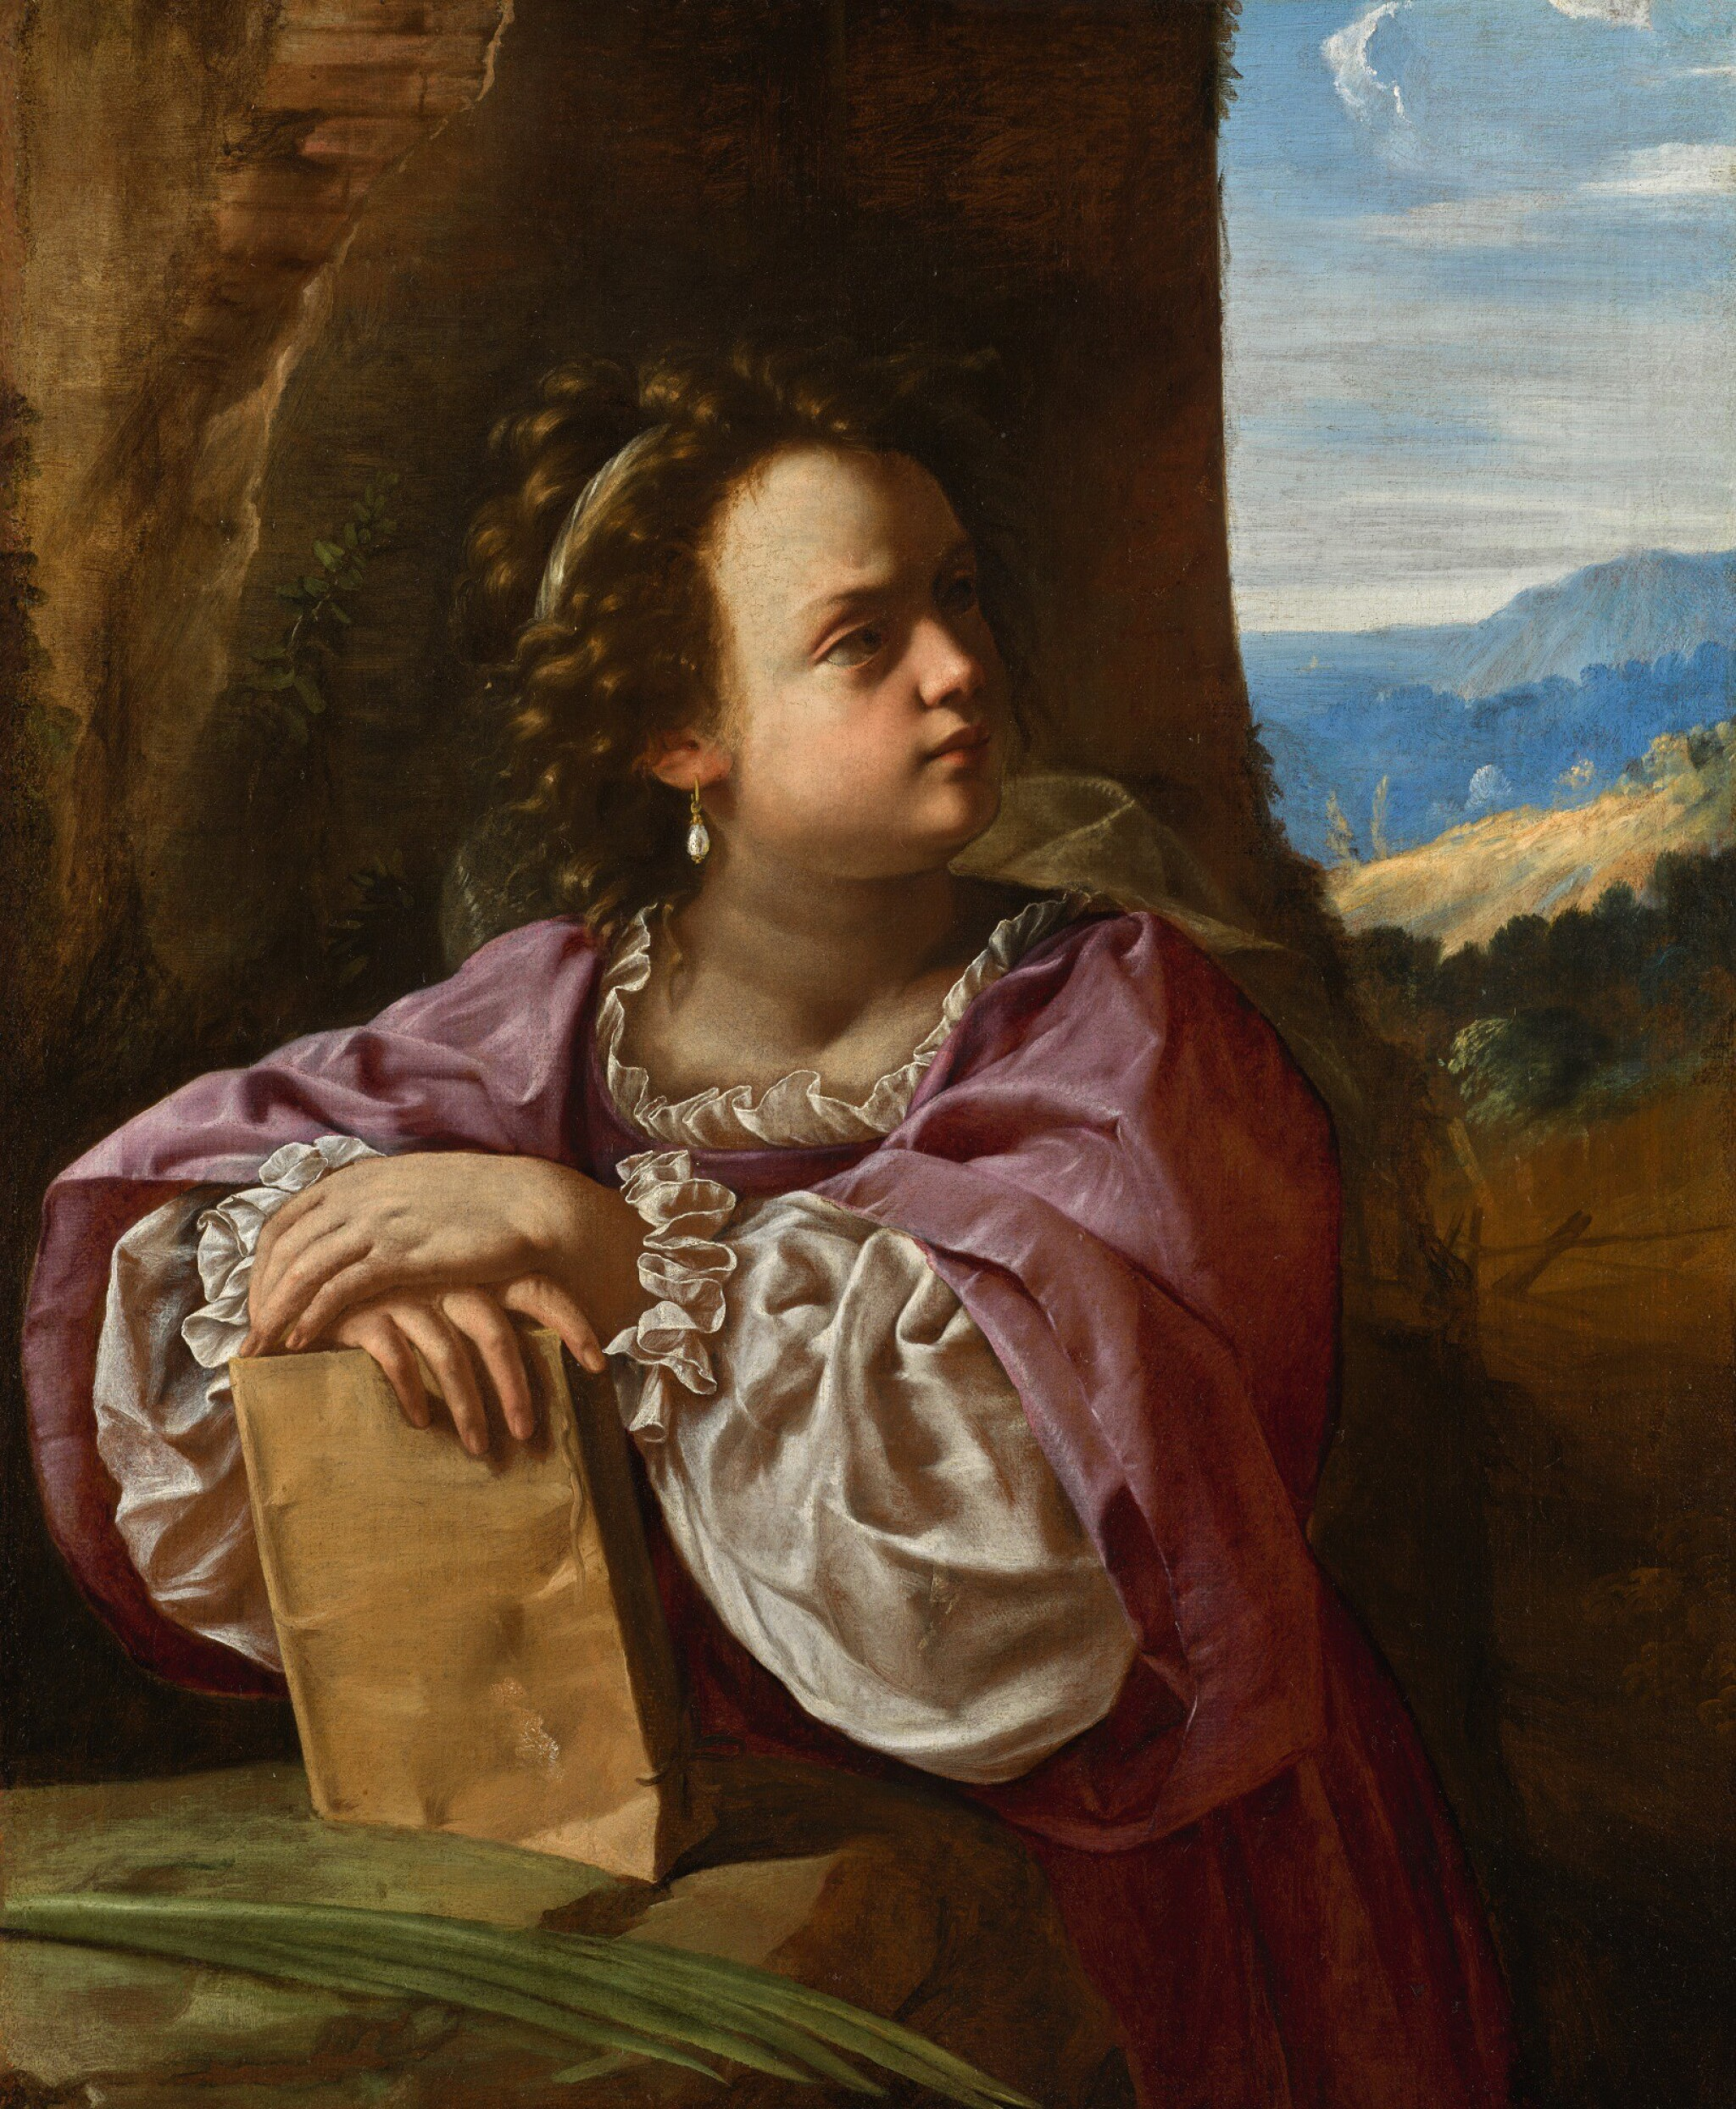 ARTEMISIA GENTILESCHI | A female martyr saint, probably Saint Catherine of Alexandria | 阿爾泰米西婭・真蒂萊斯基 | 《殉道聖女,應為亞歷山大的聖加大肋納》